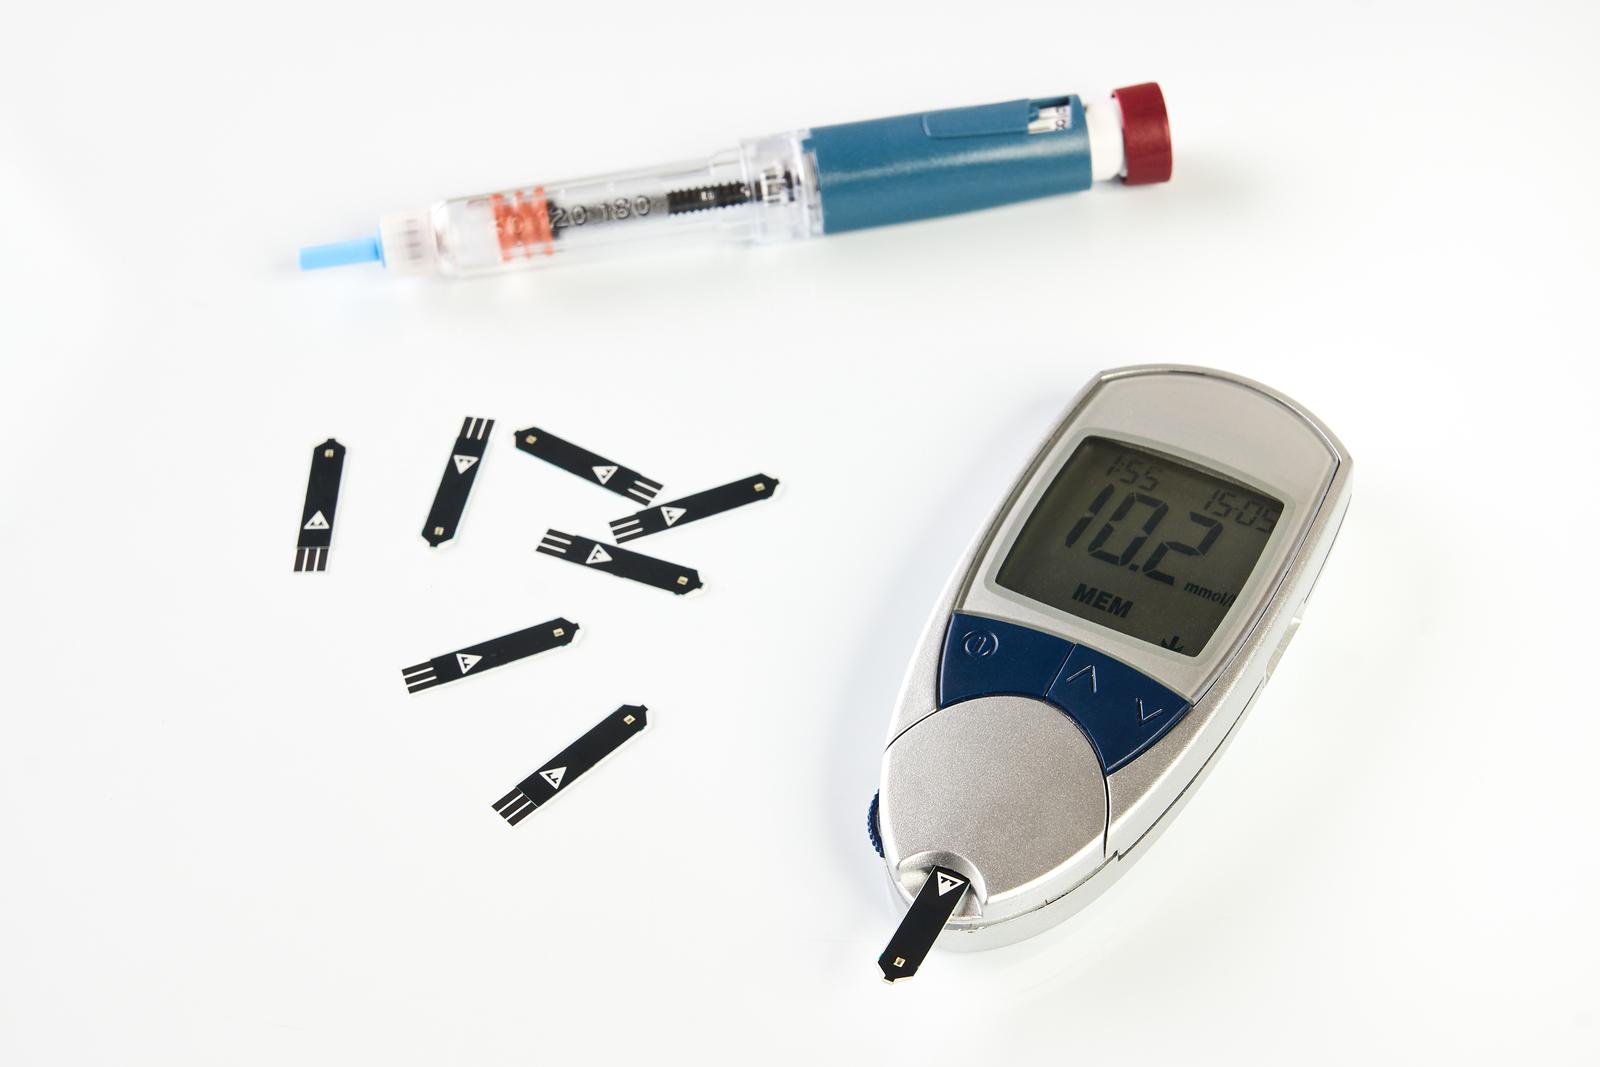 Diabetes Equipment, Insulin Pen And Glucose Level Blood Test